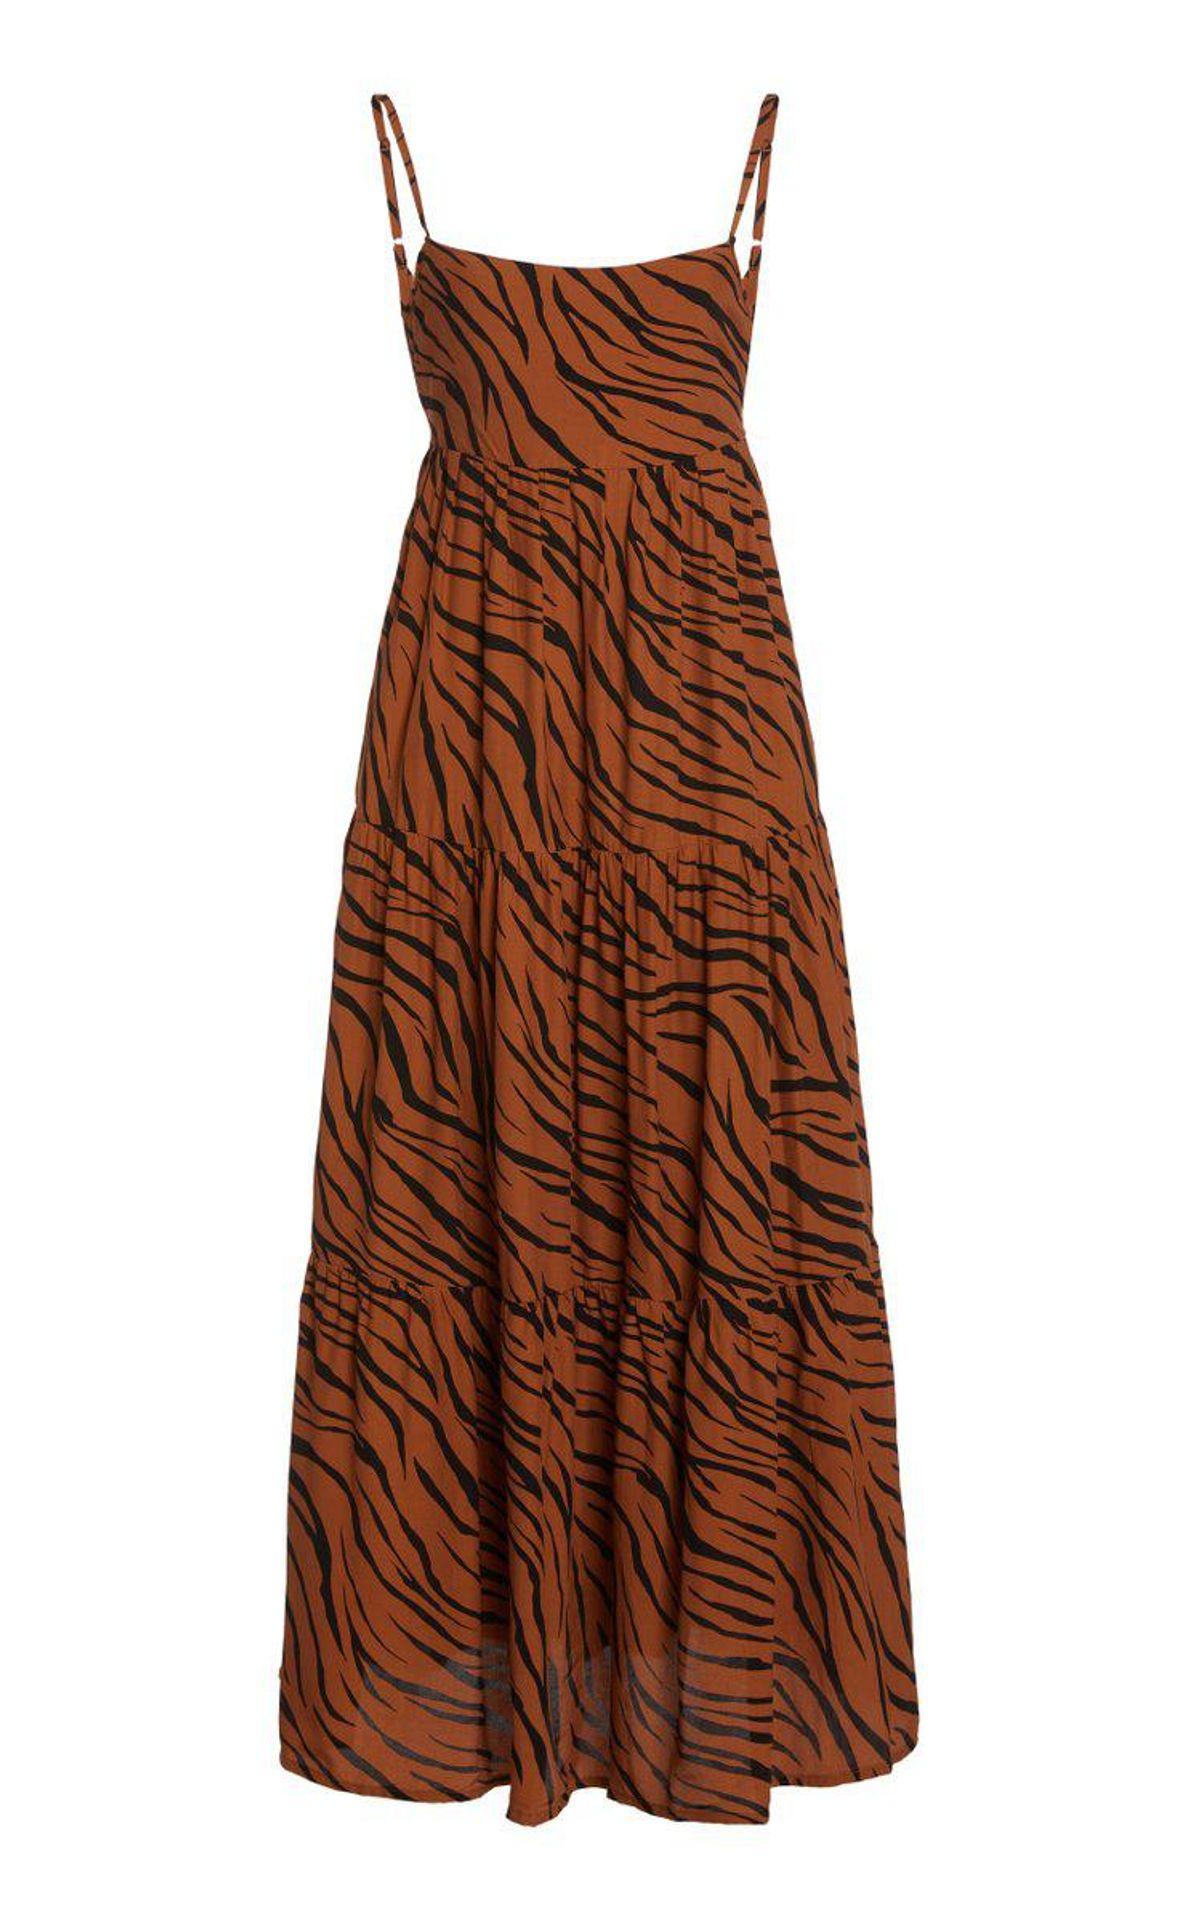 Corvina Tiger-Print Crepe Tiered Midi Dress